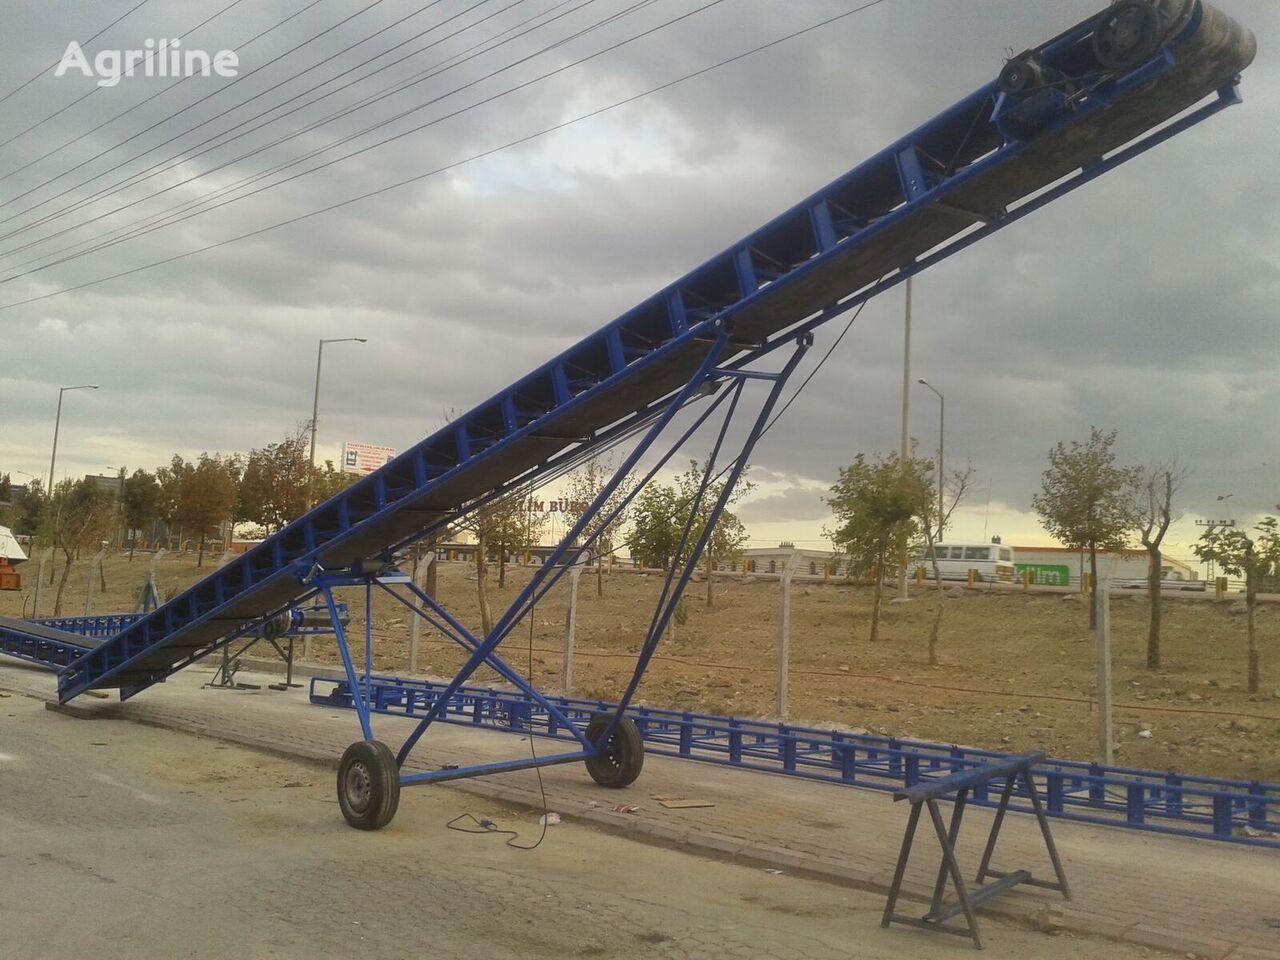 new 10 MT CONVEYOR BELT  agricultural conveyor